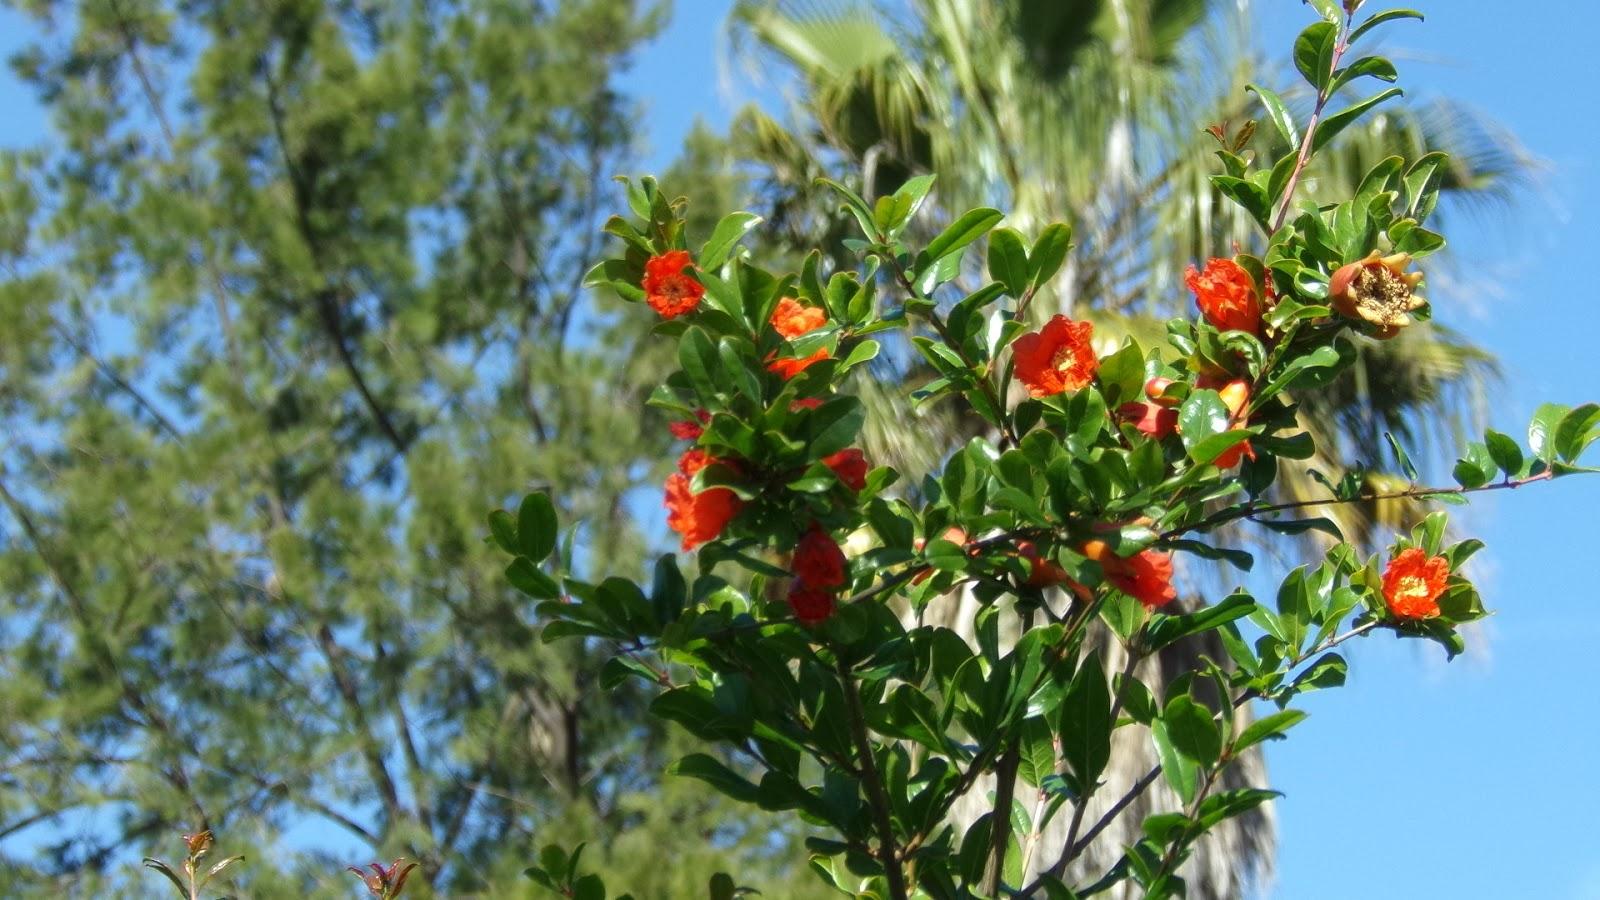 39 blog sur le portugal to discover portugal 39 for Portent ses fruits